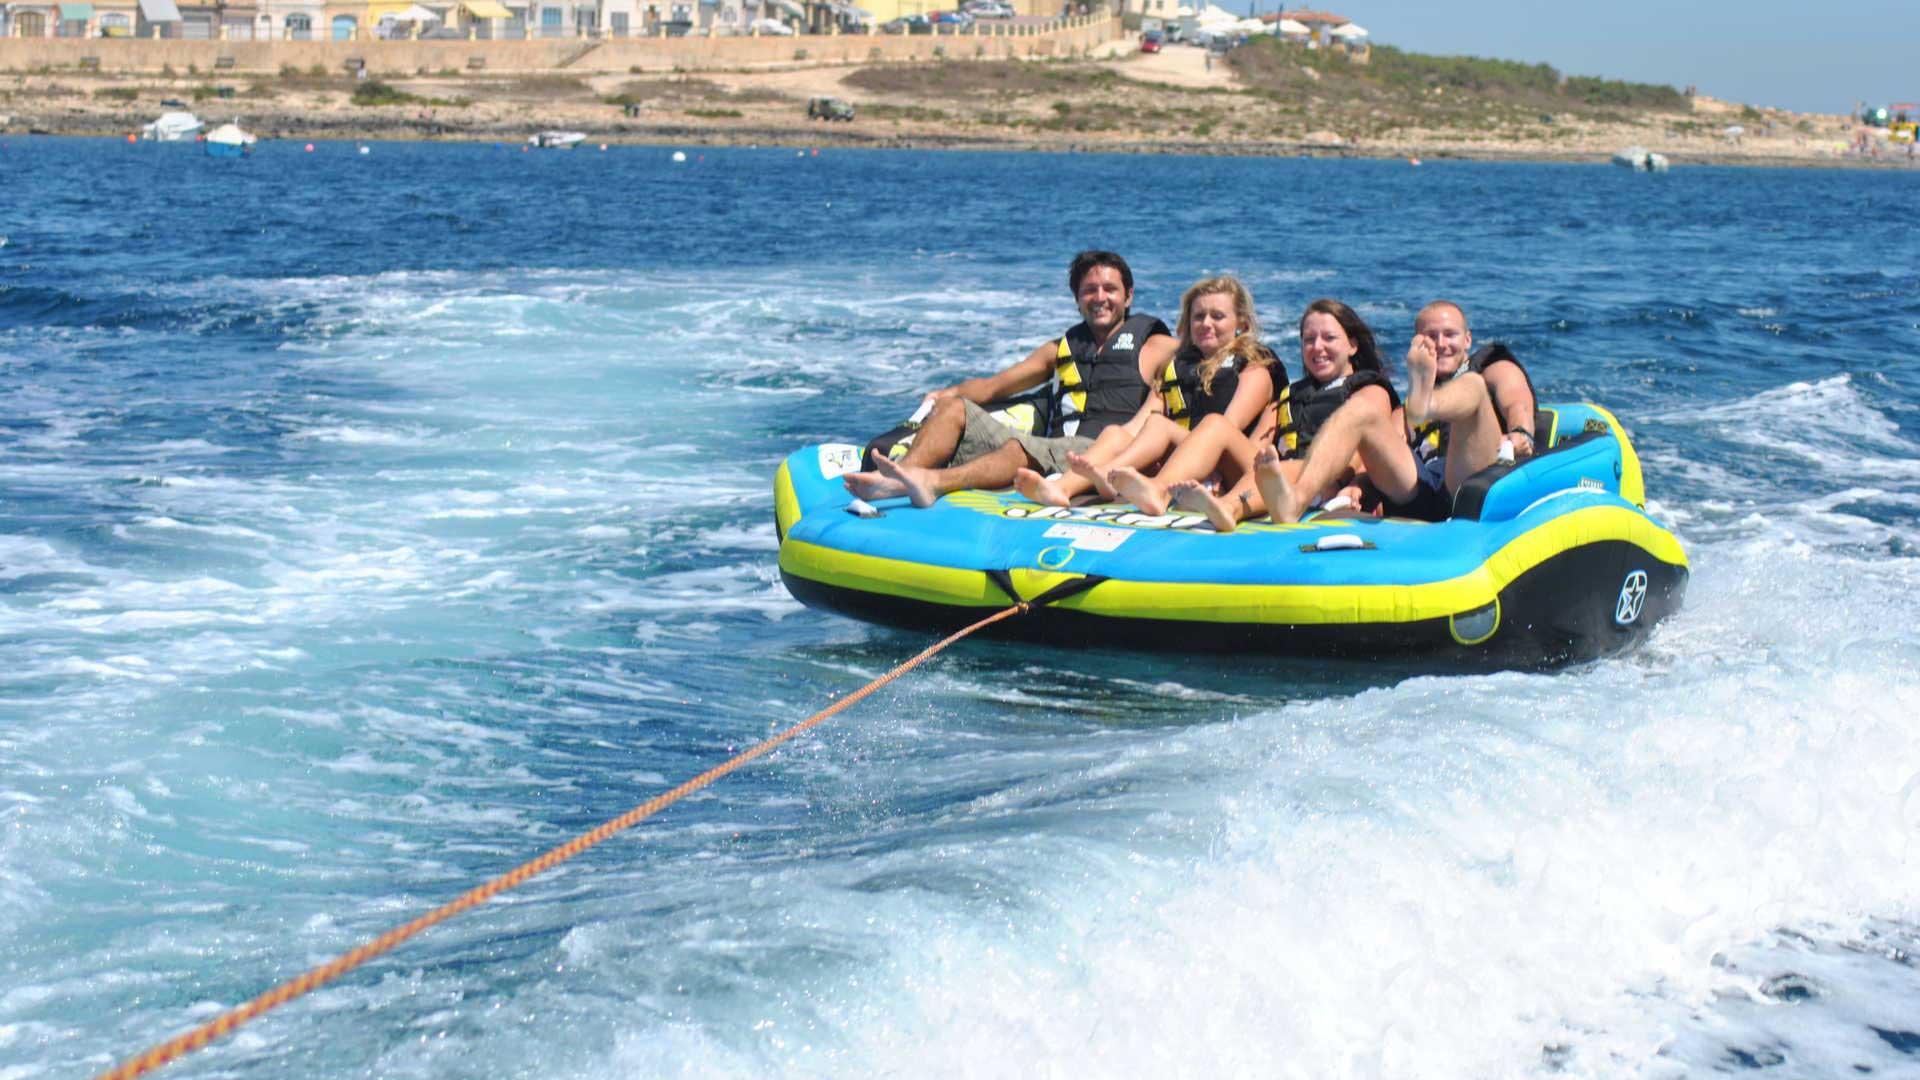 AX Sunny Coast Resort and Spa - Water Sports